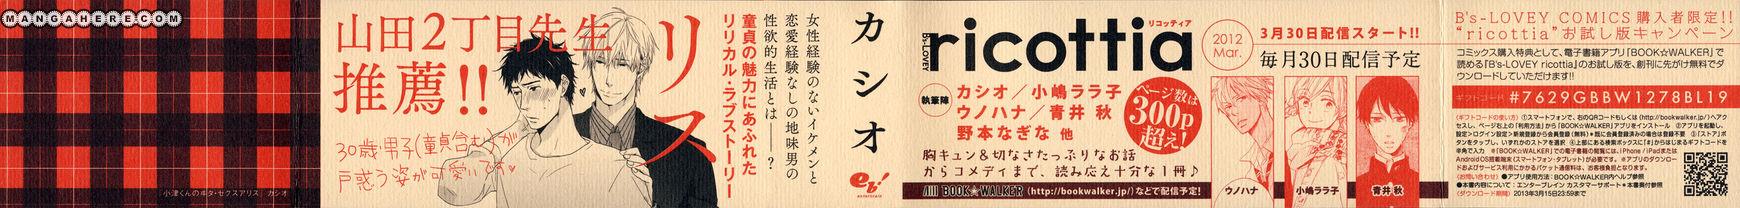 Odu-kun no Vita Sexualis 1 Page 2